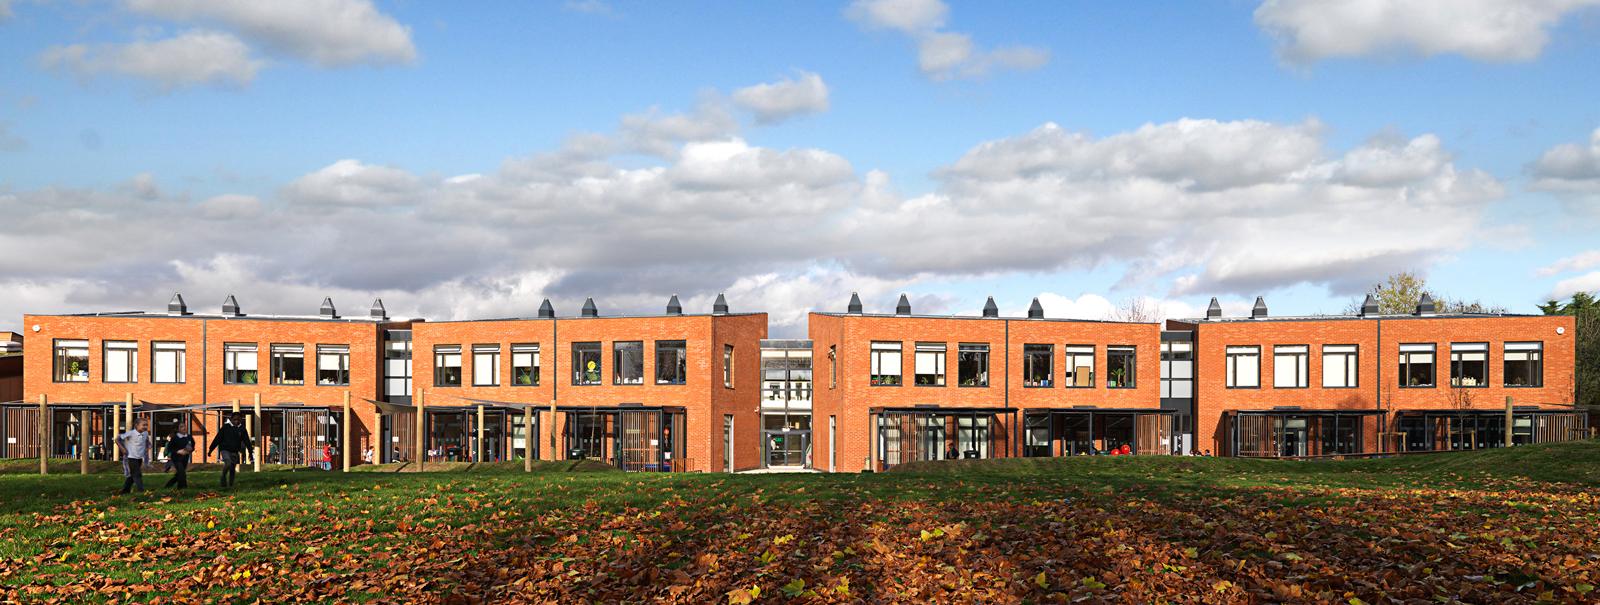 Rushey Green Primary School